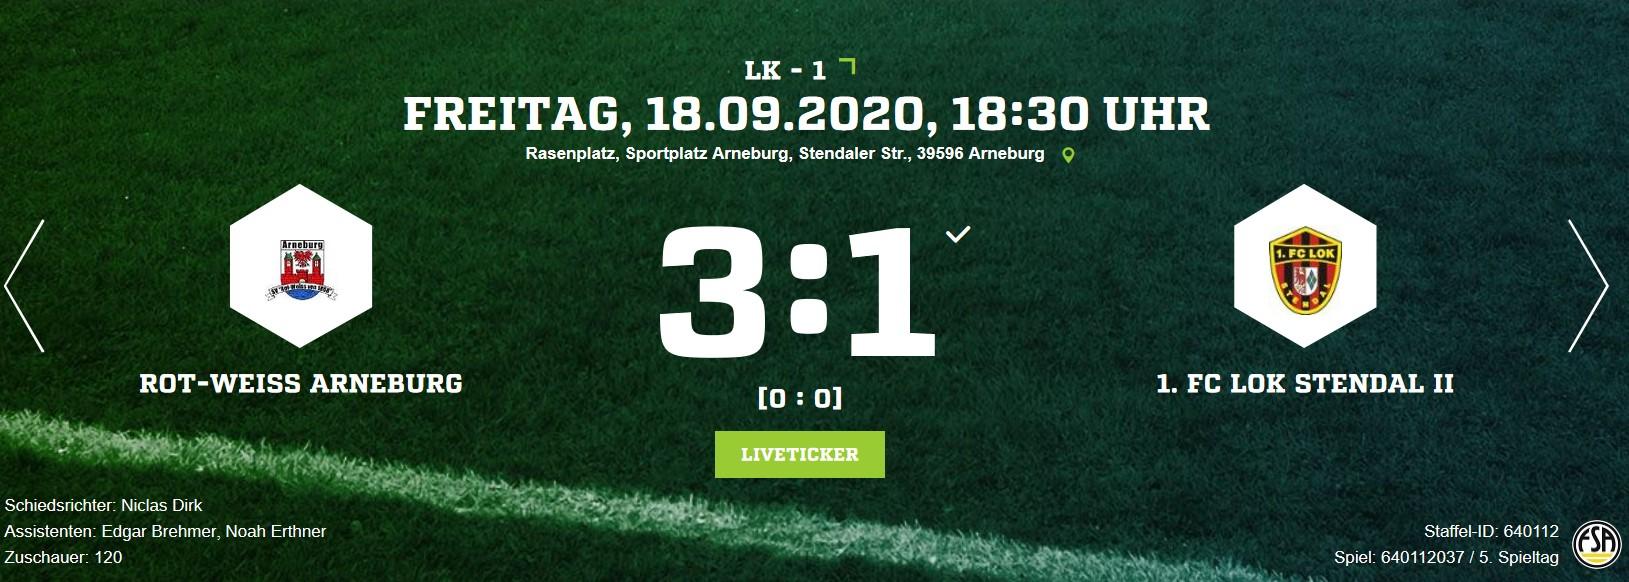 Landesklasse 1 ► 5. Spieltag - 1. FC Lok Stendal